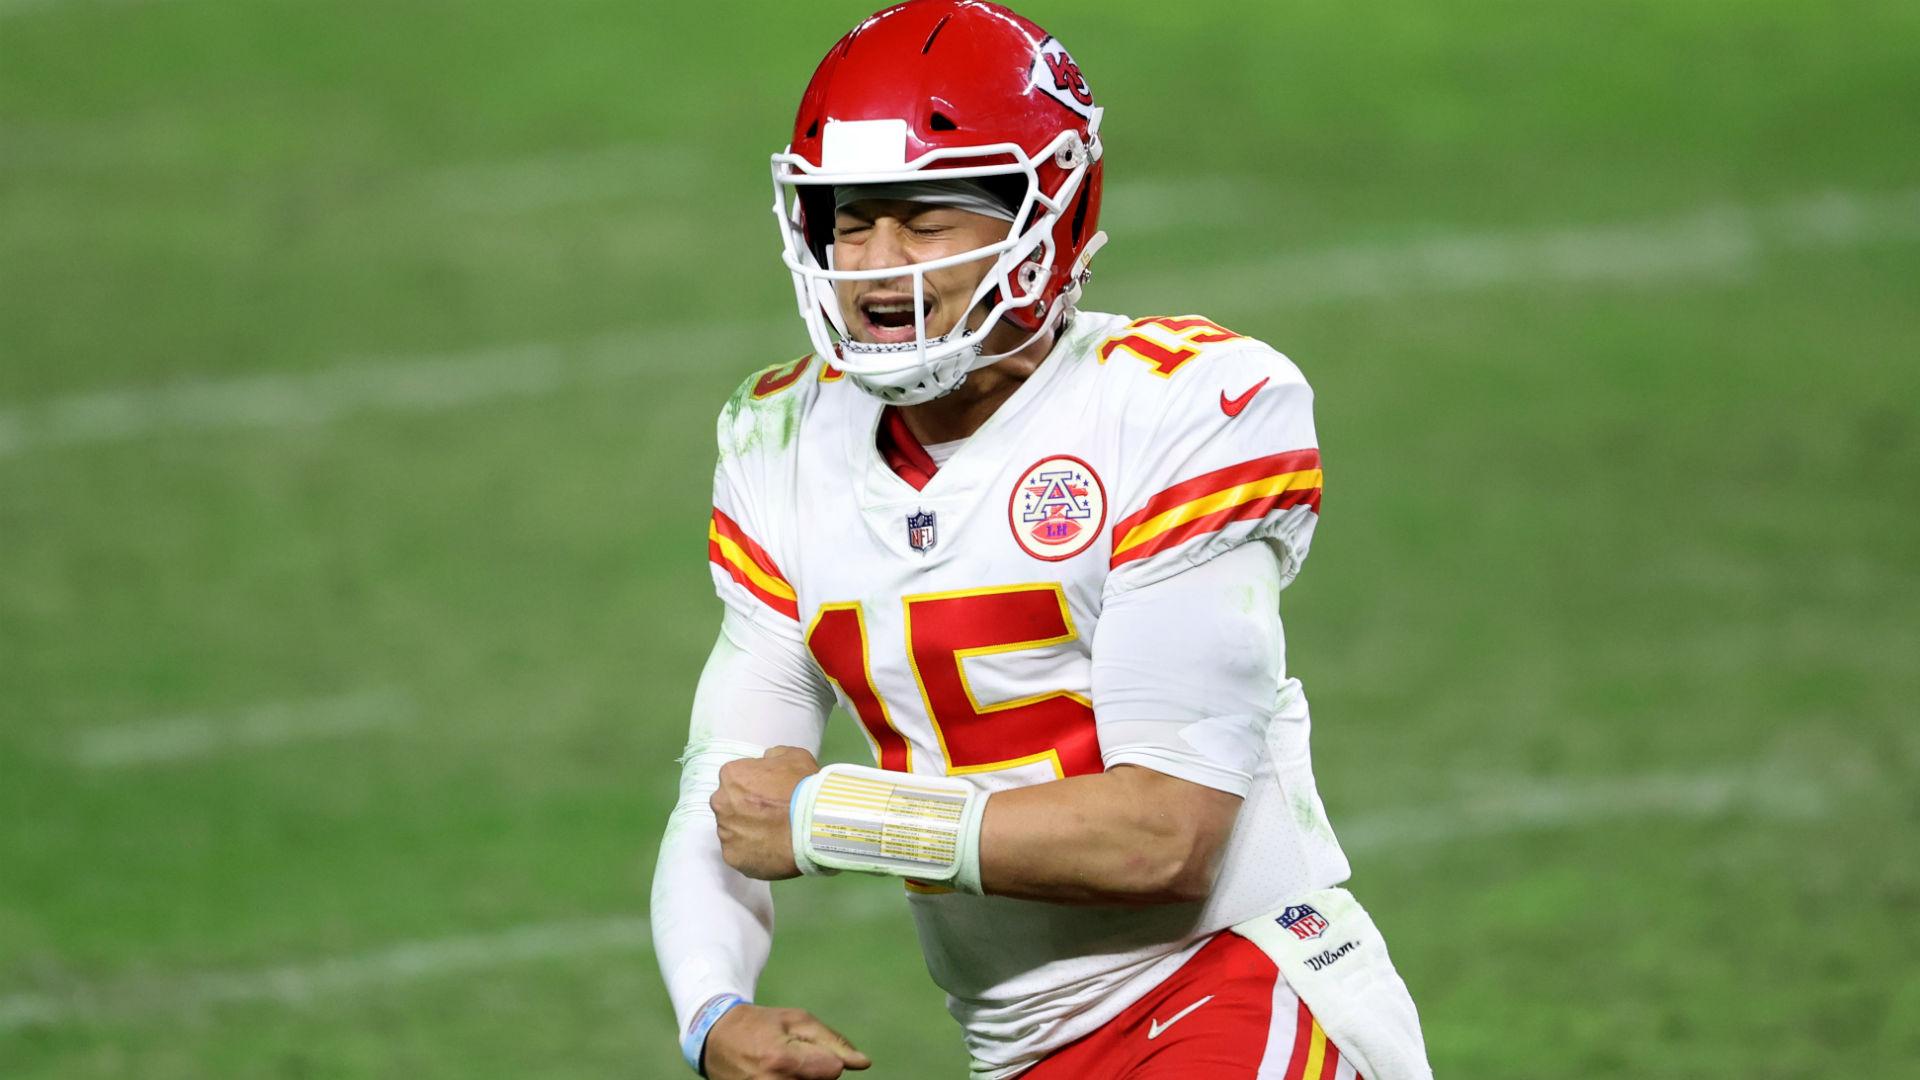 NFL picks, predictions against spread Week 12: Chiefs edge Bucs; Eagles stun Seahawks; Raiders rebound